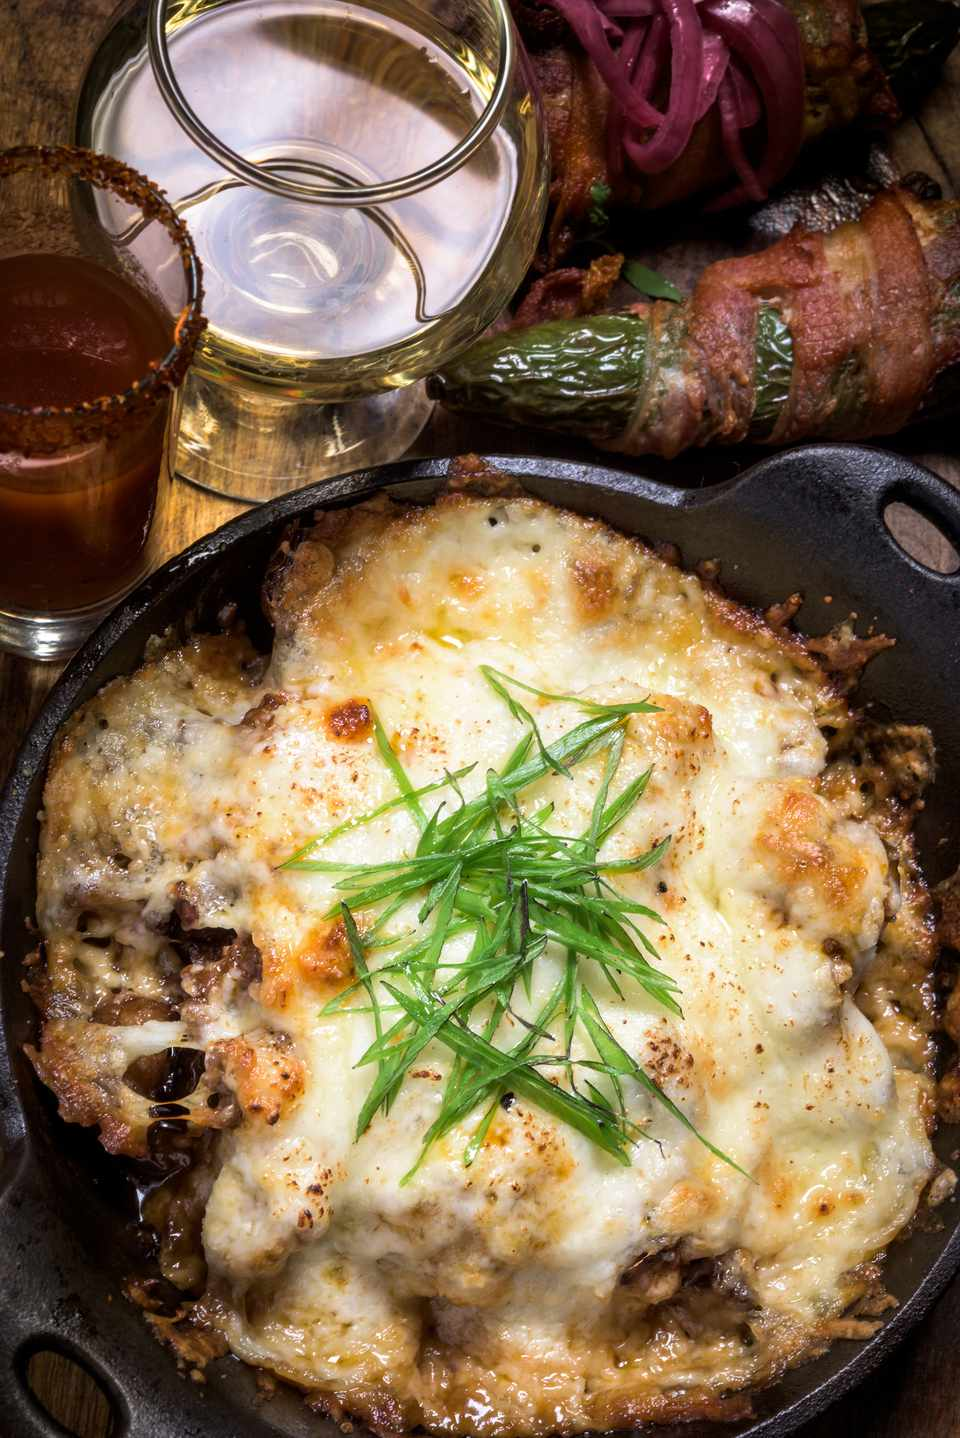 Queso fundido con chorizo (melted cheese with chorizo)